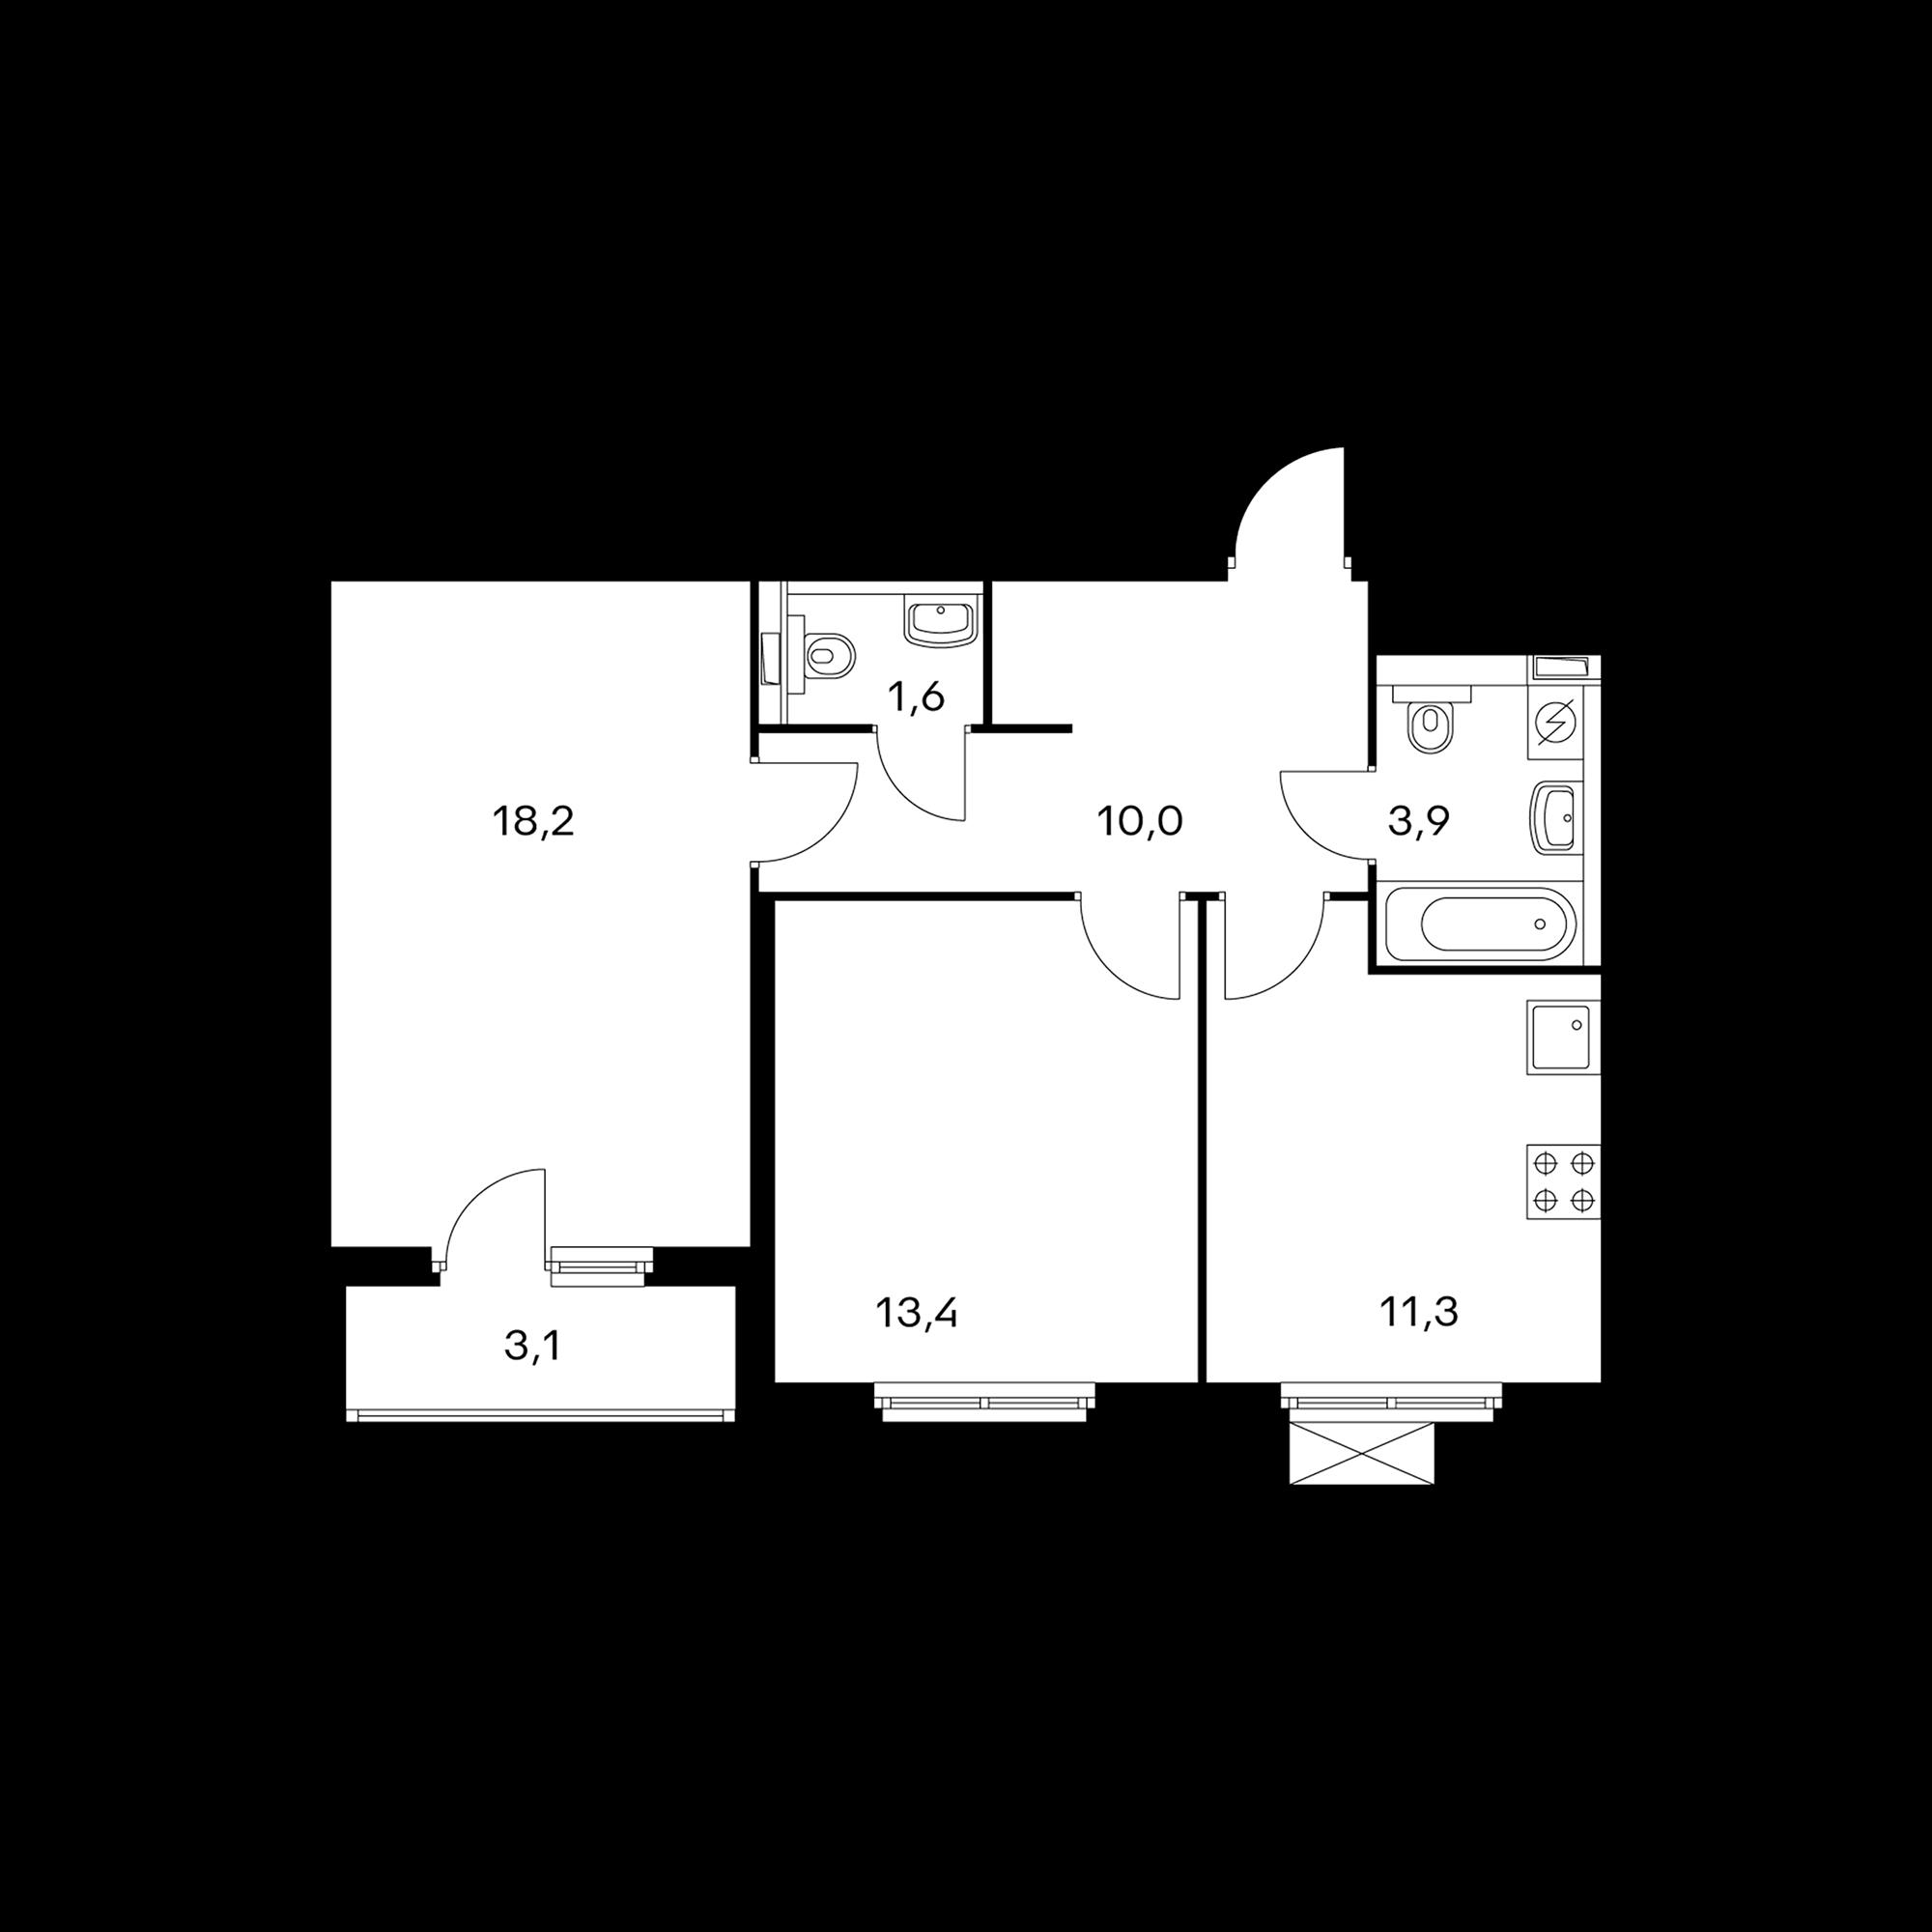 2KL6_10.5-1_S_ZL